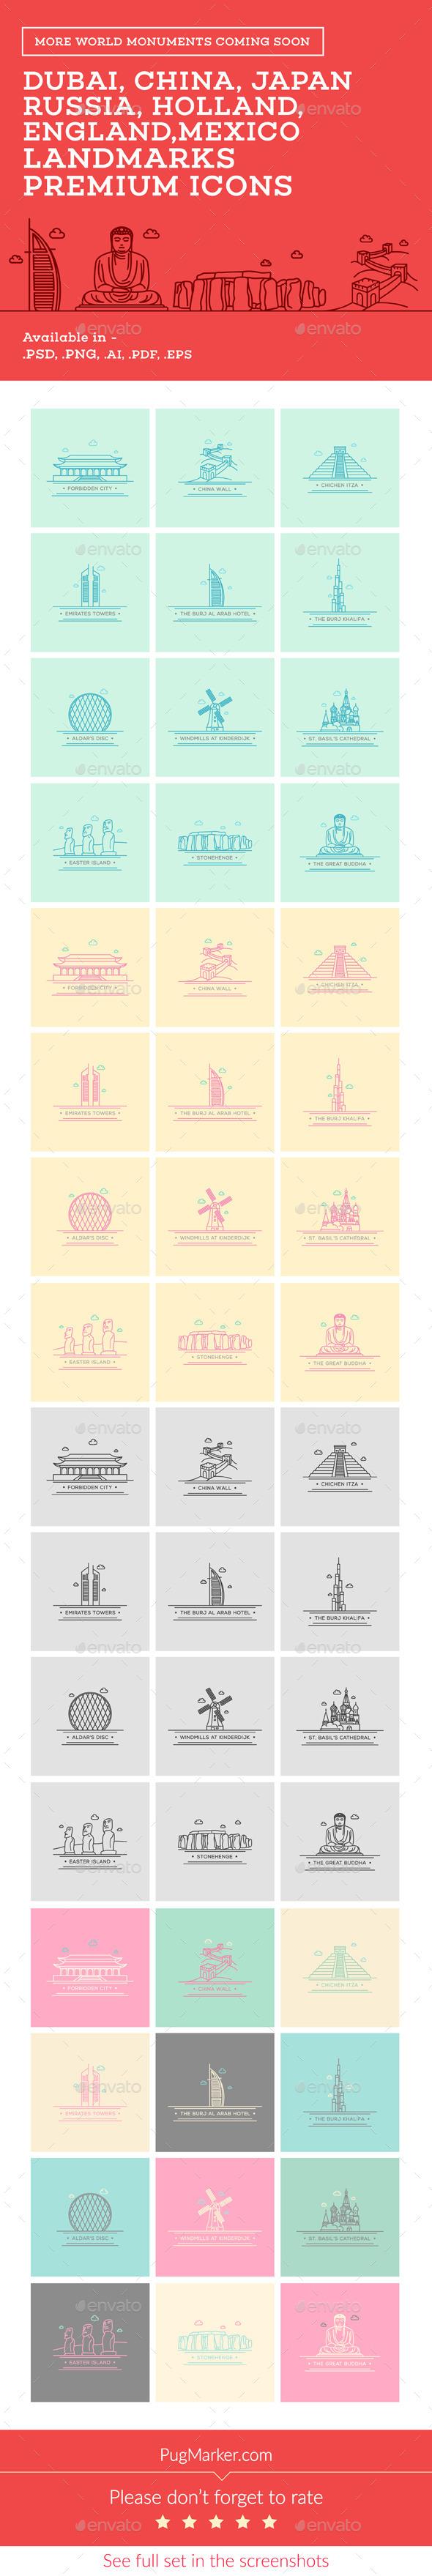 GraphicRiver World Landmark Icons Vol 2 10763318